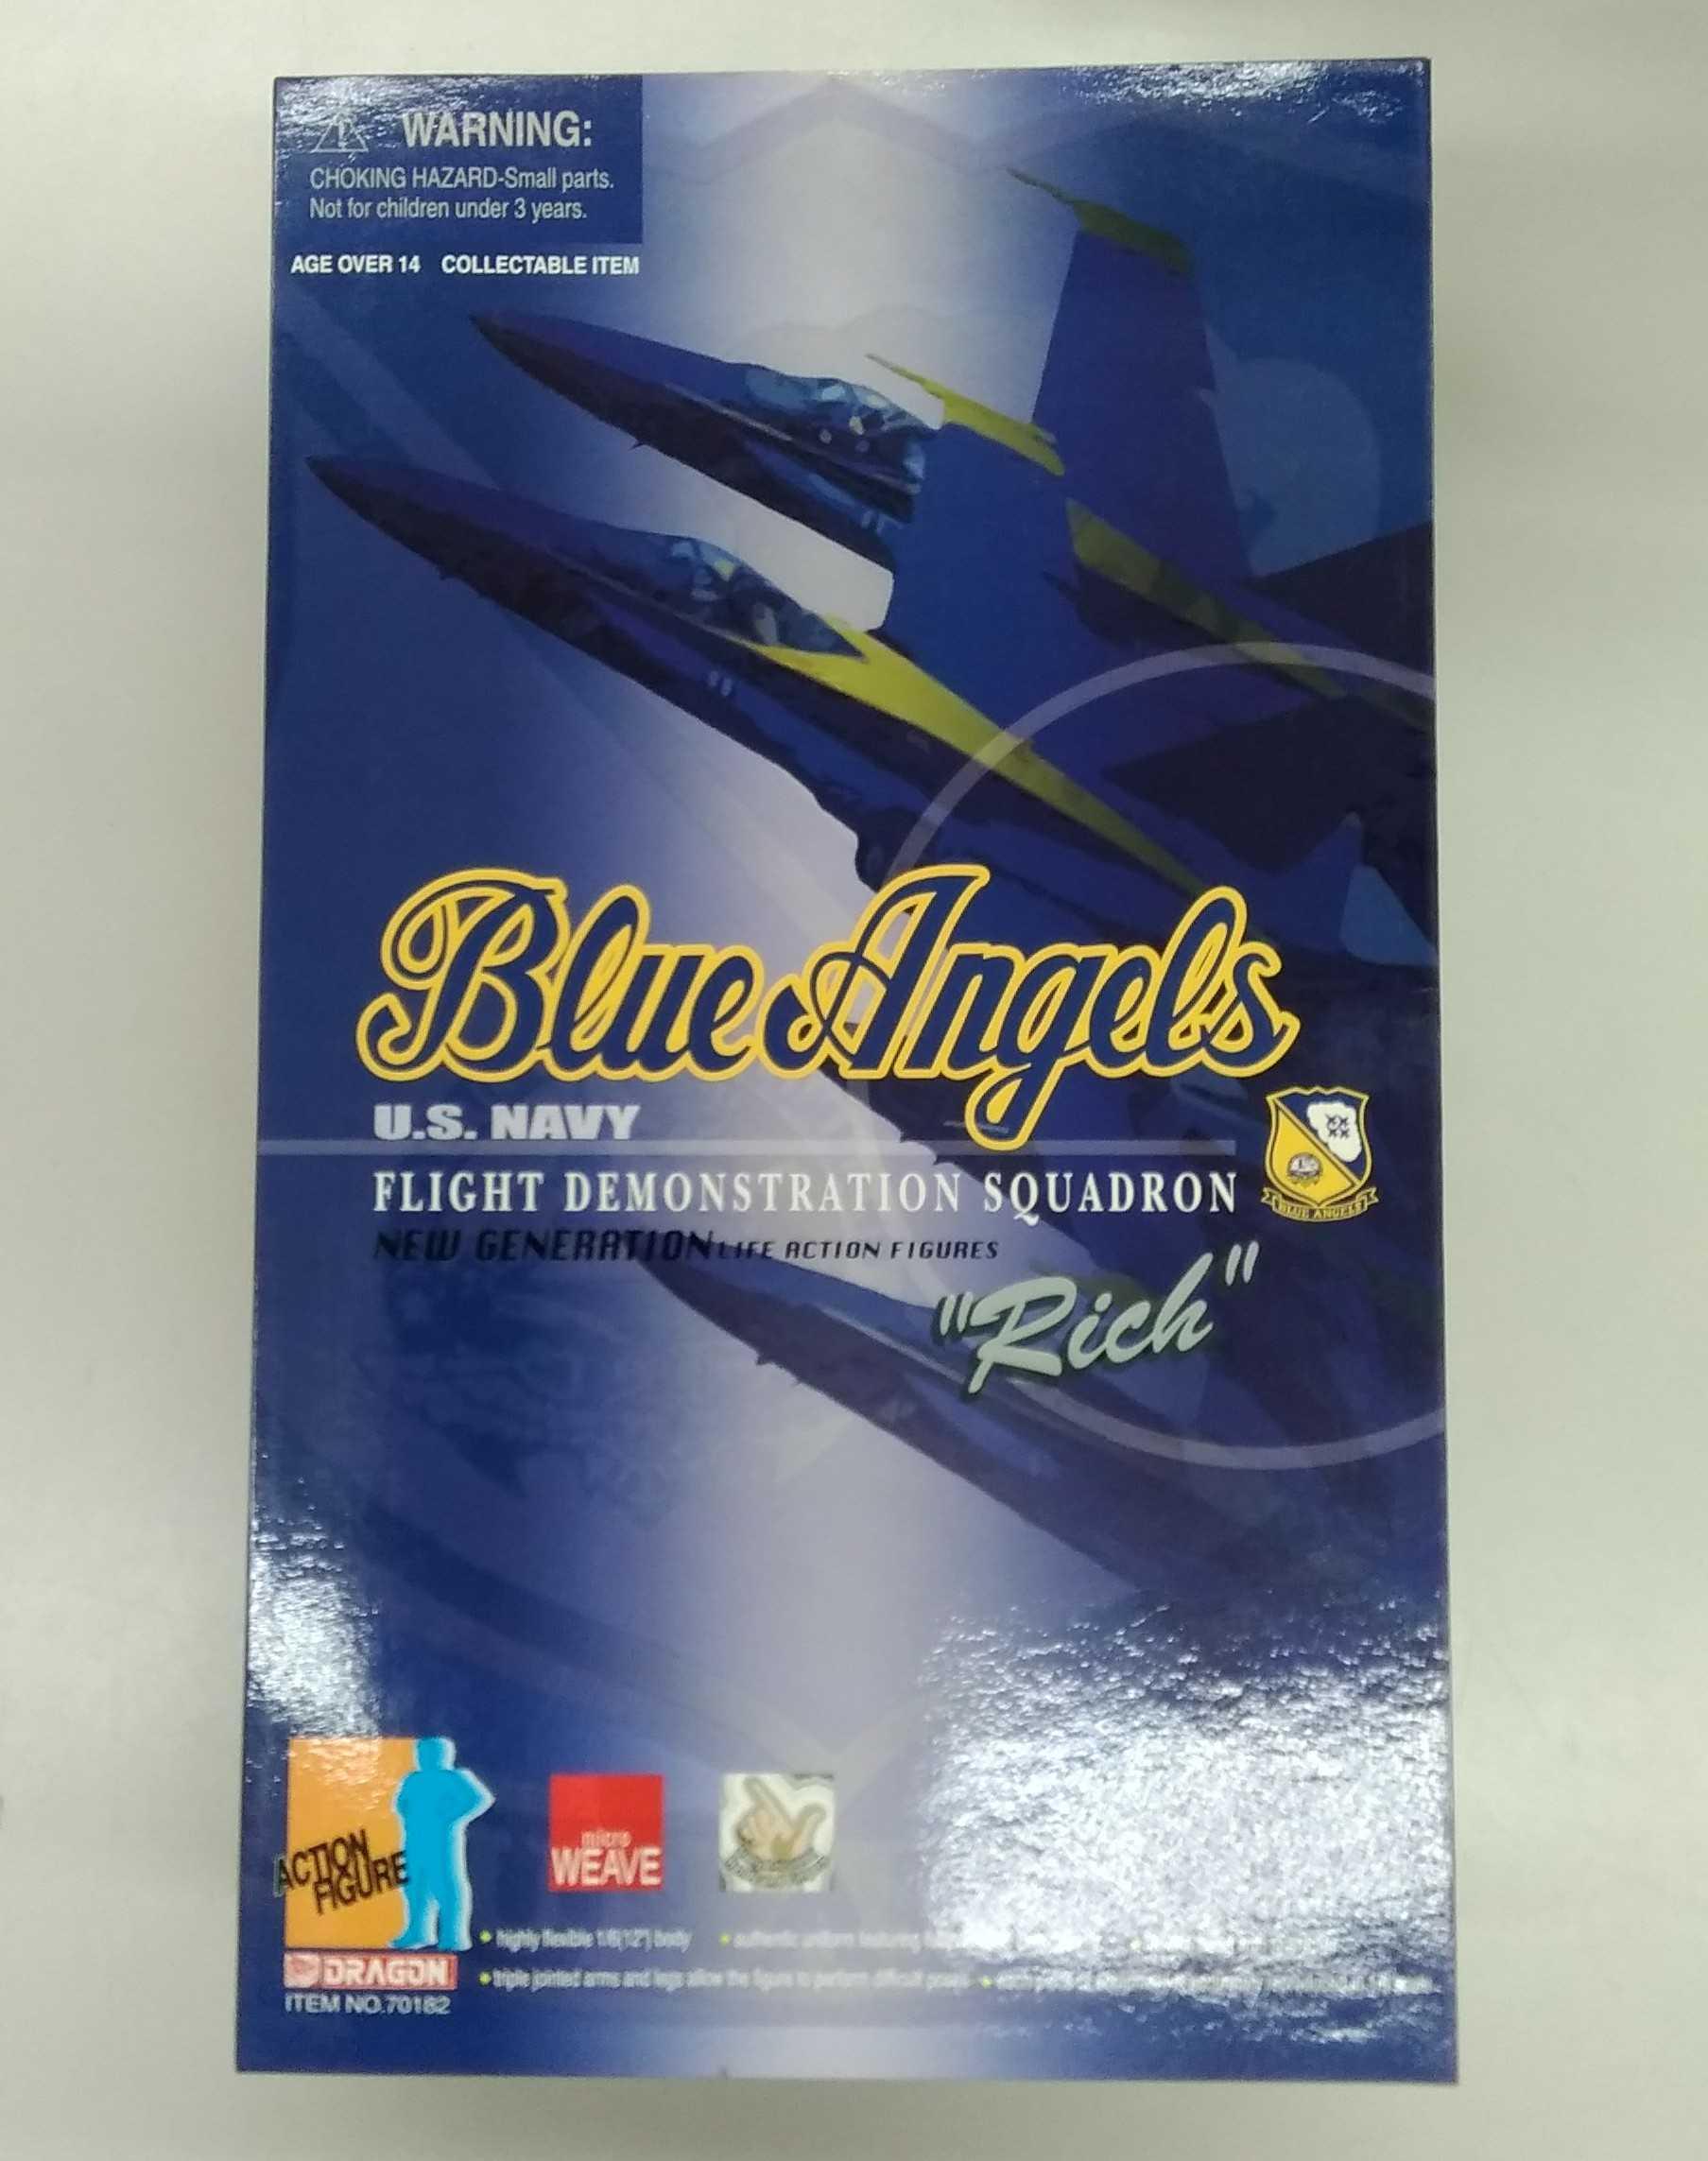 BLUE ANGELS DRAGON